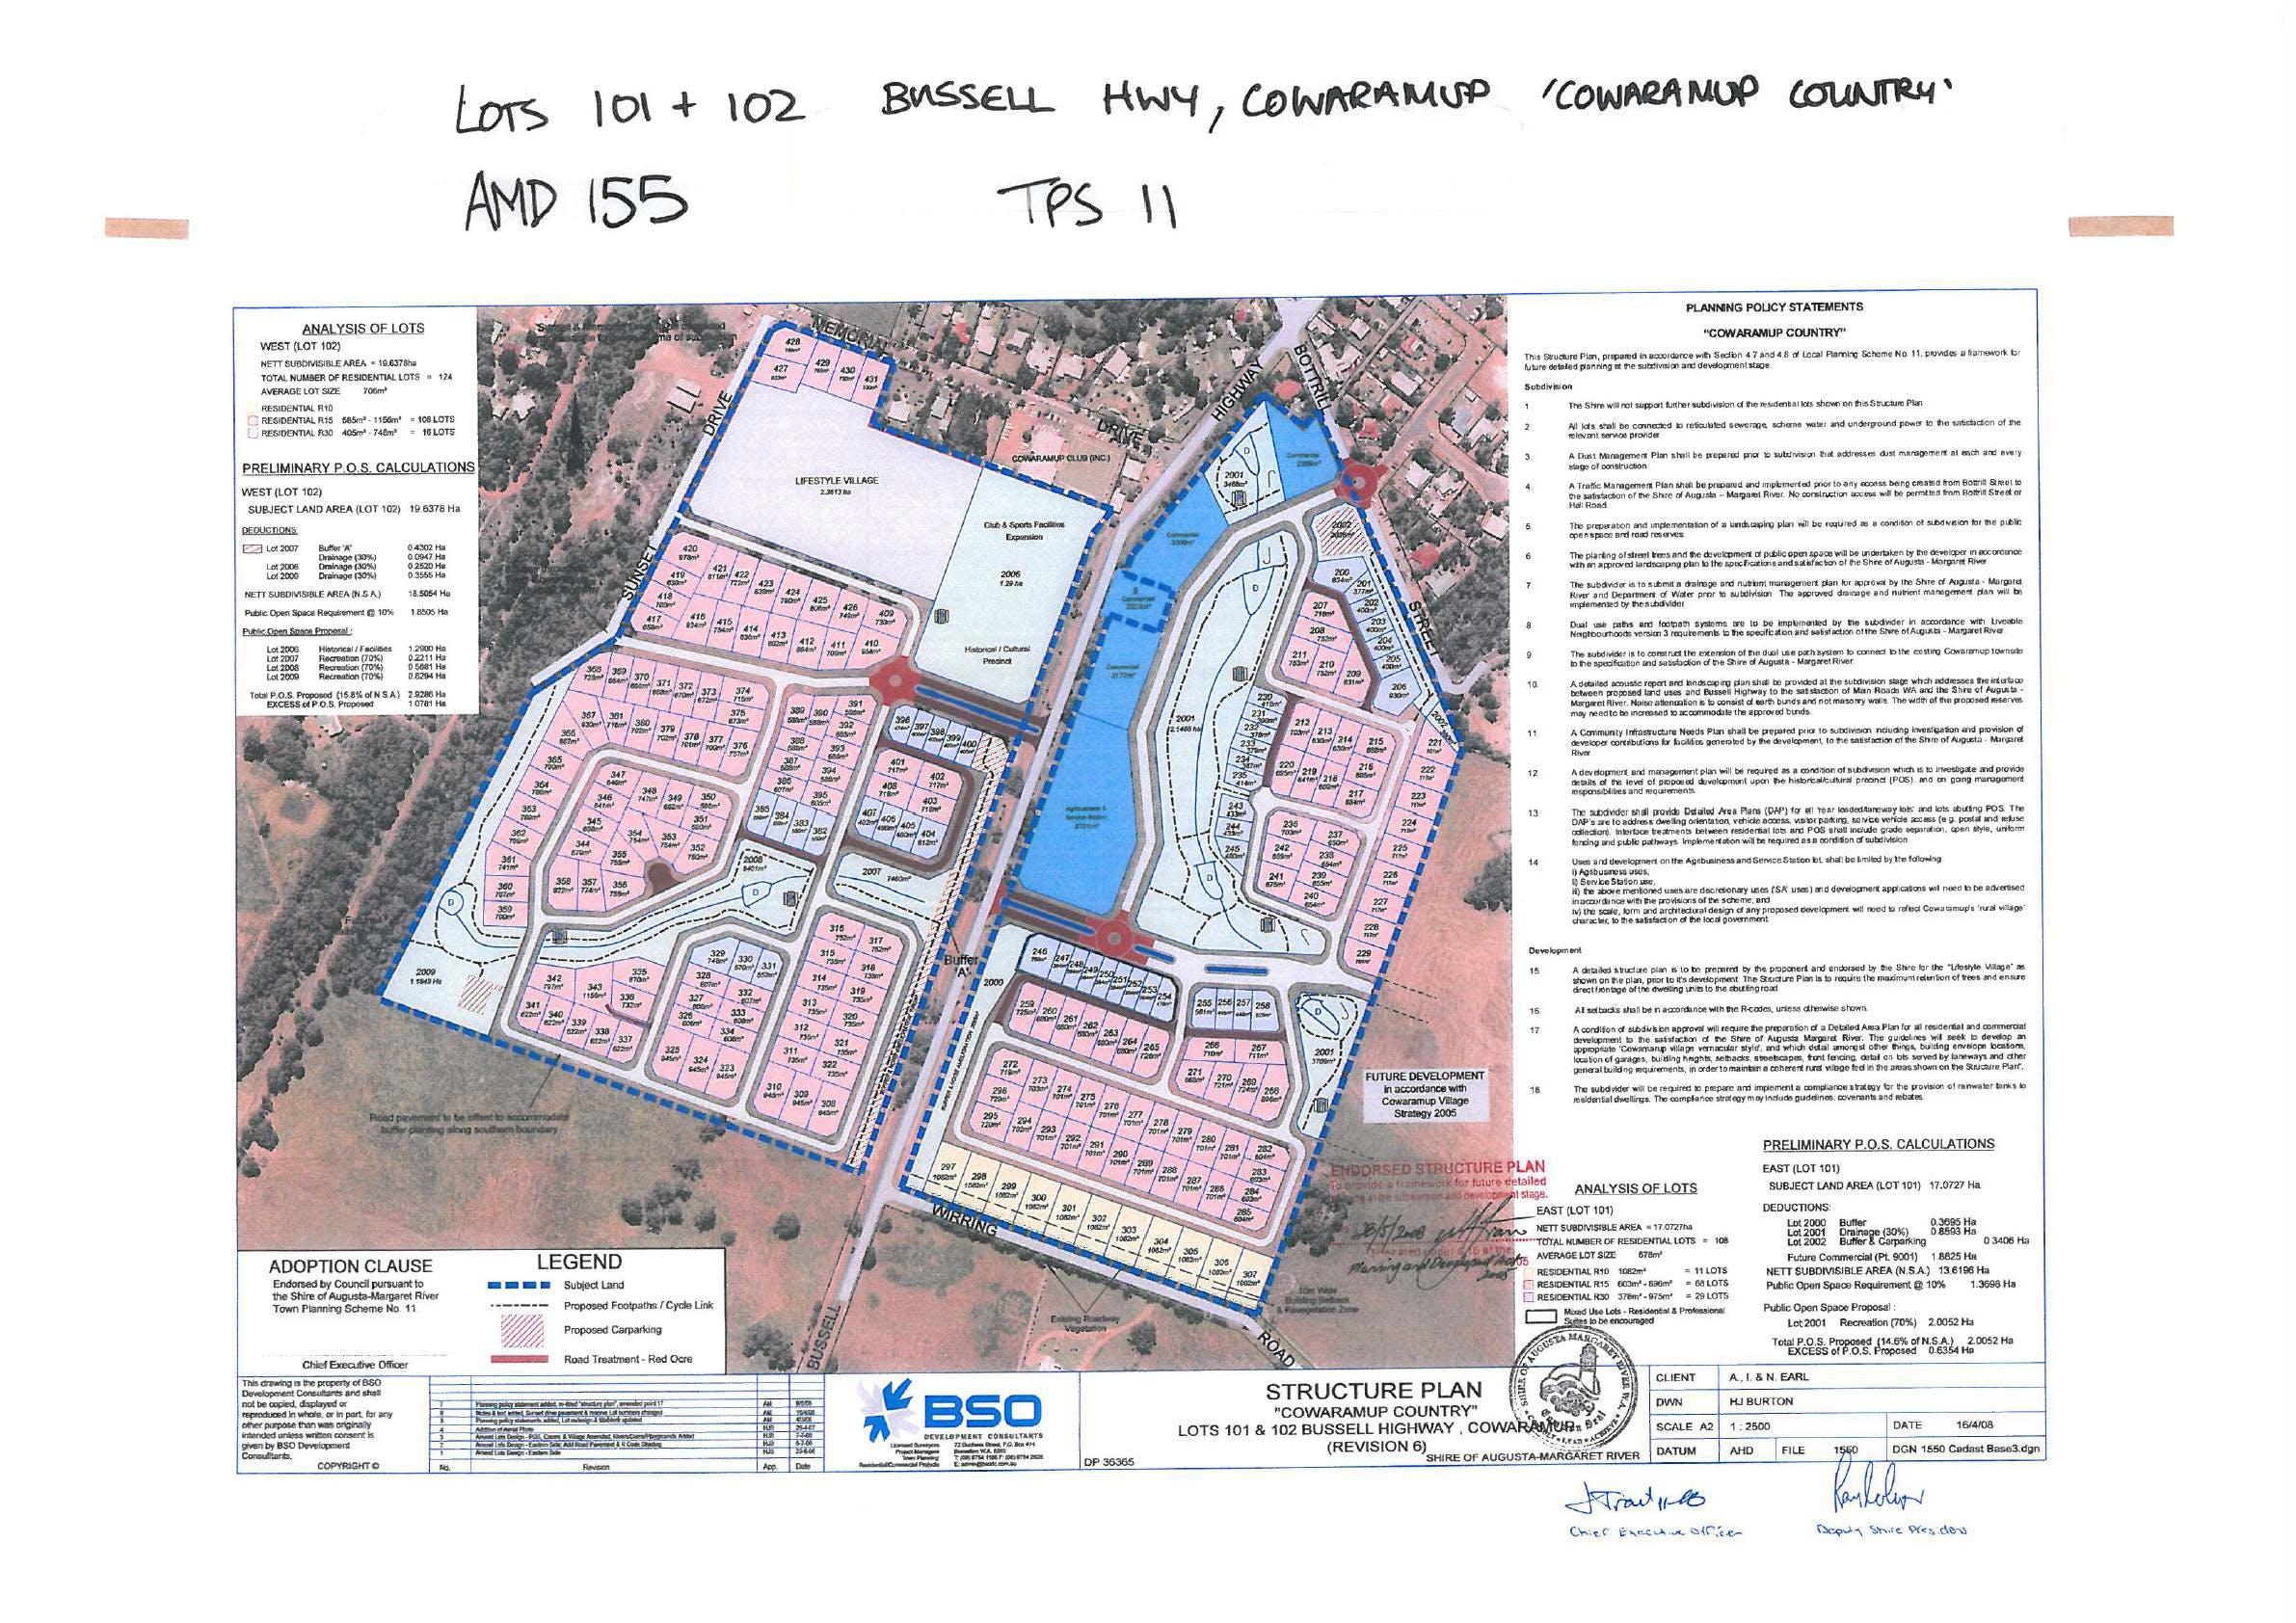 Cowaramup Structure Plan